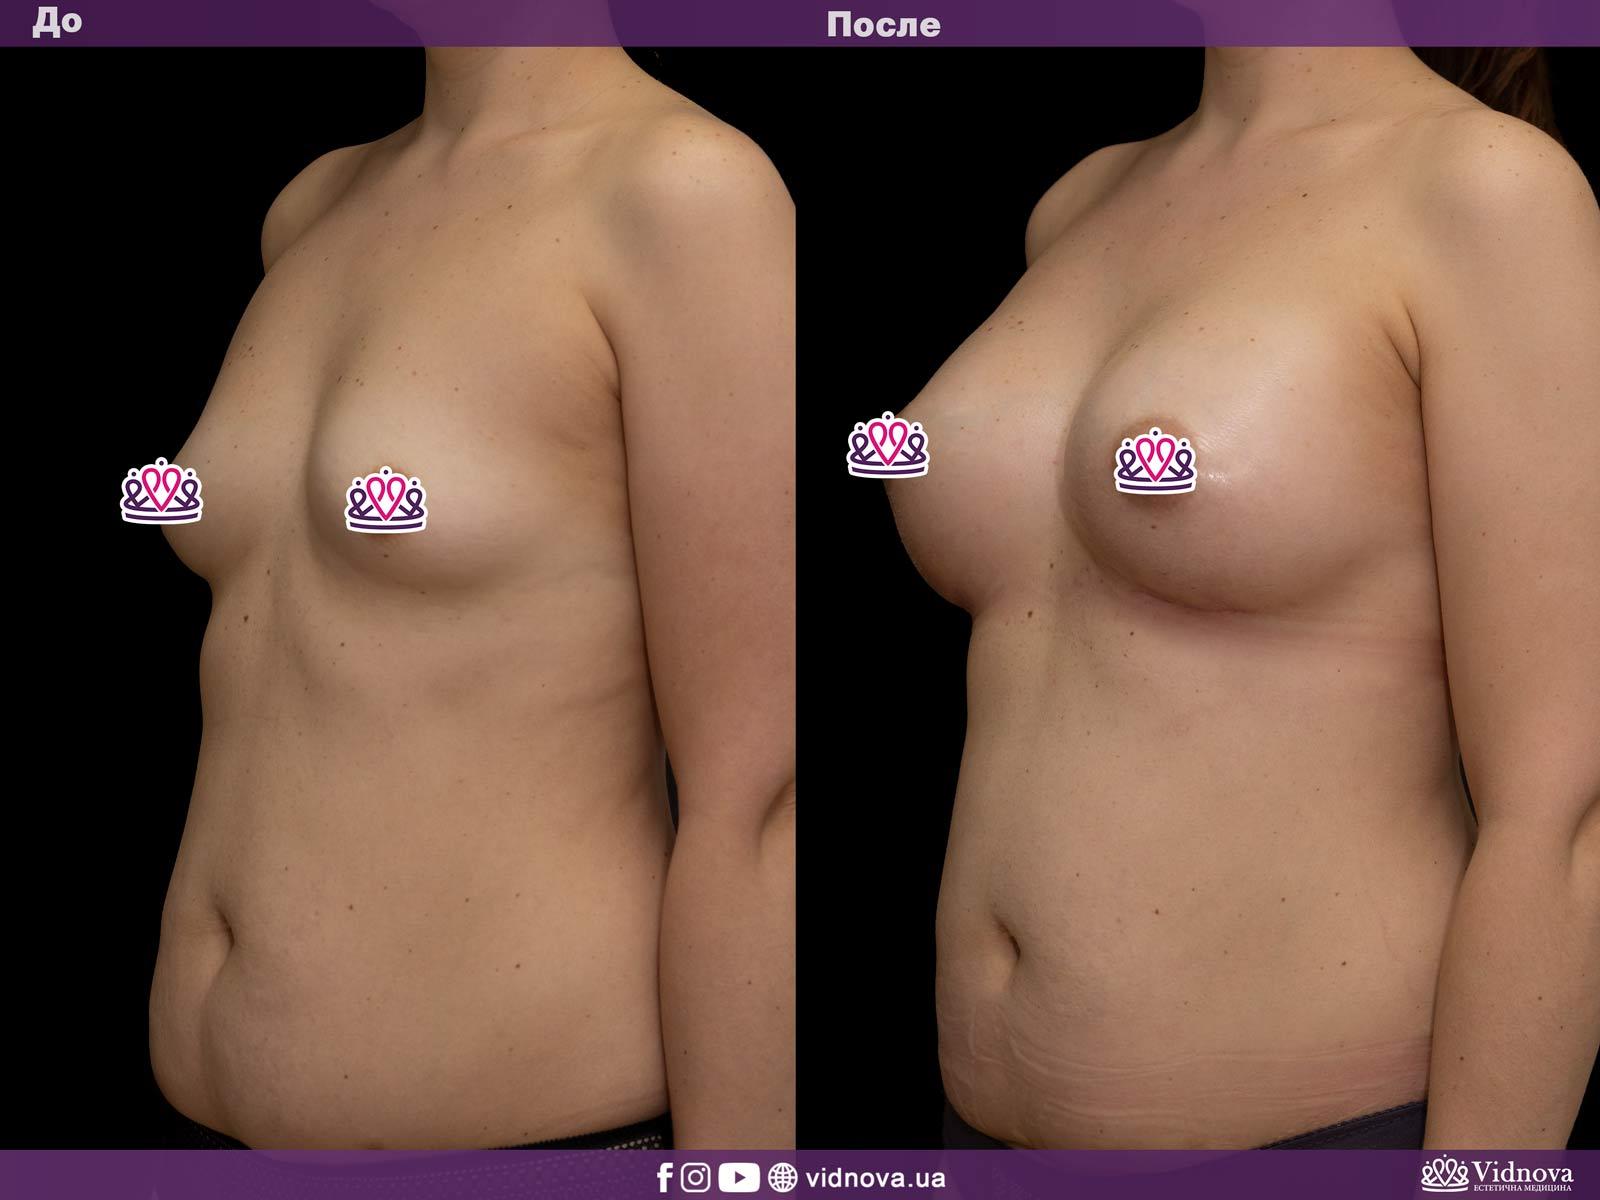 Увеличение груди: Фото ДО и ПОСЛЕ - Пример №23-2 - Клиника Vidnova